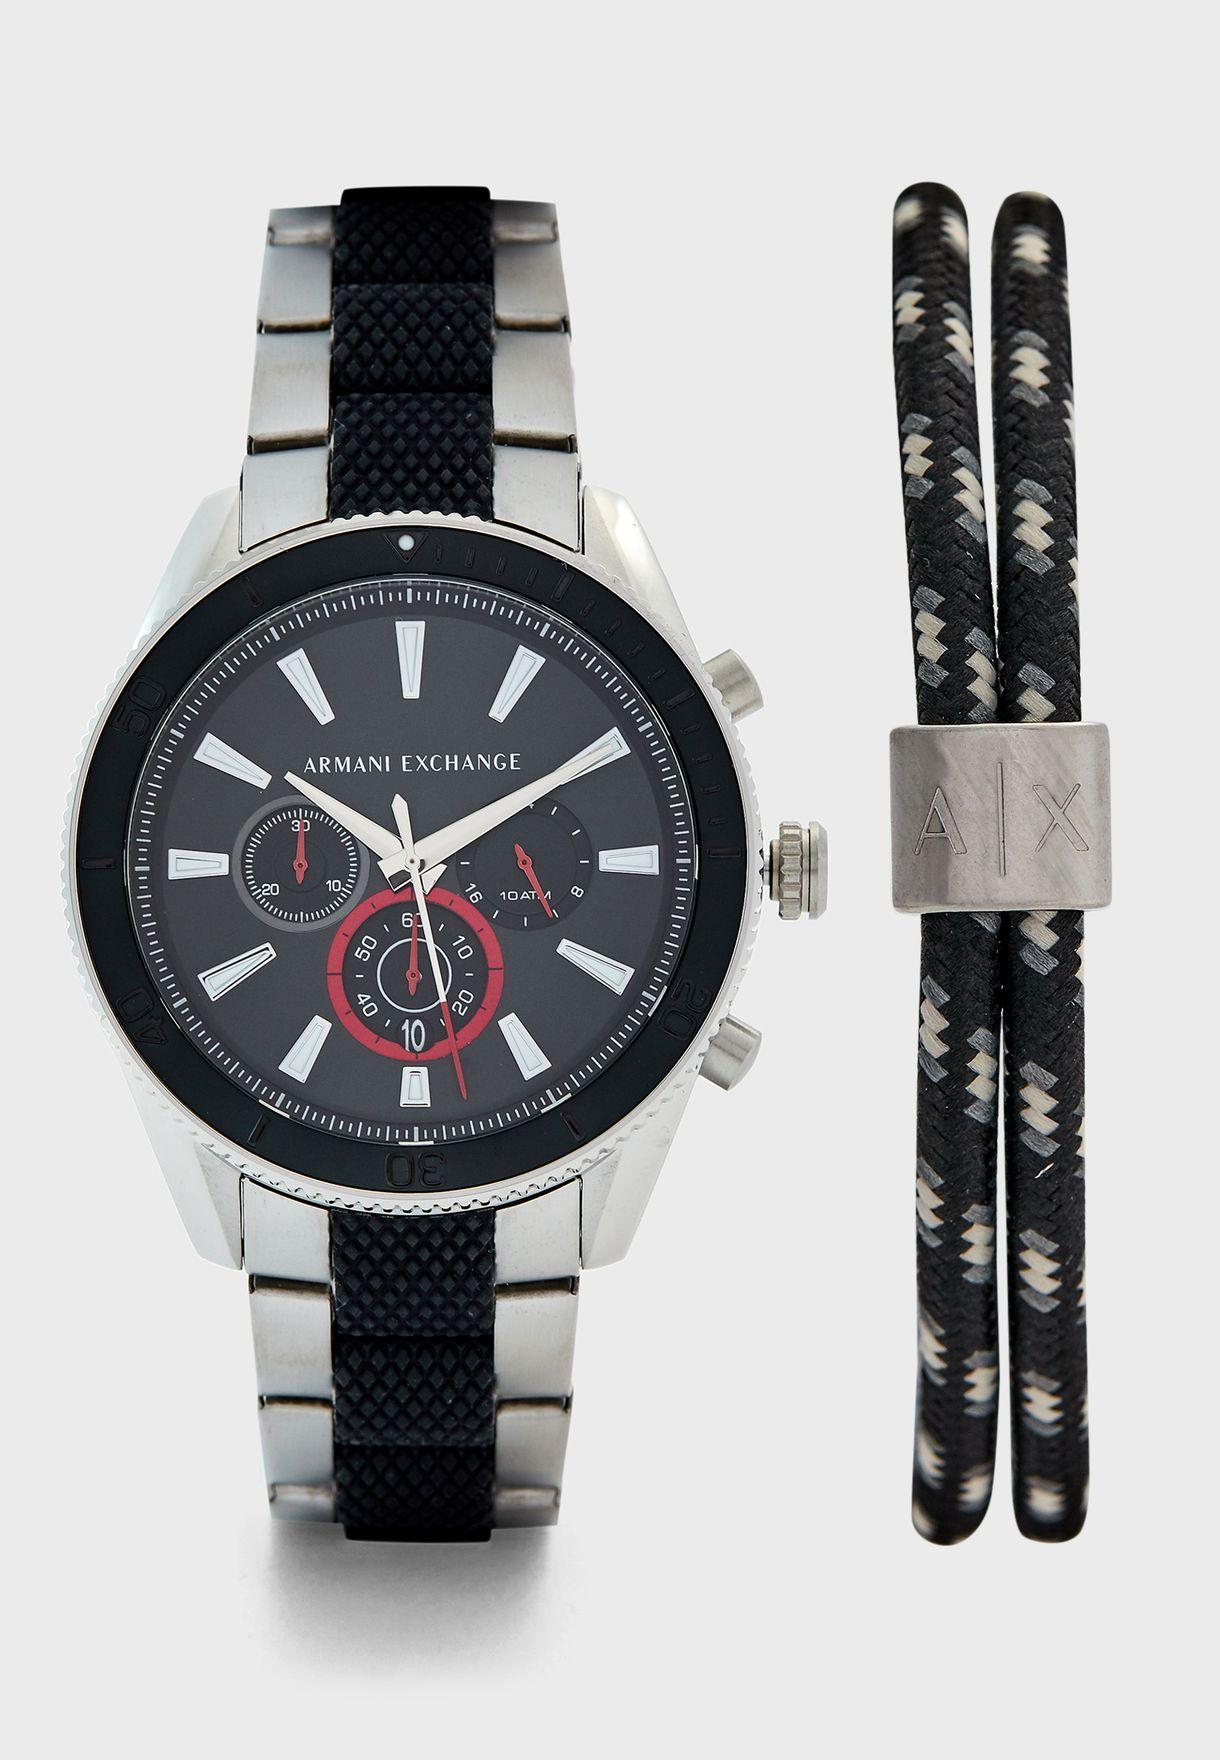 AX7106 Analog Watch